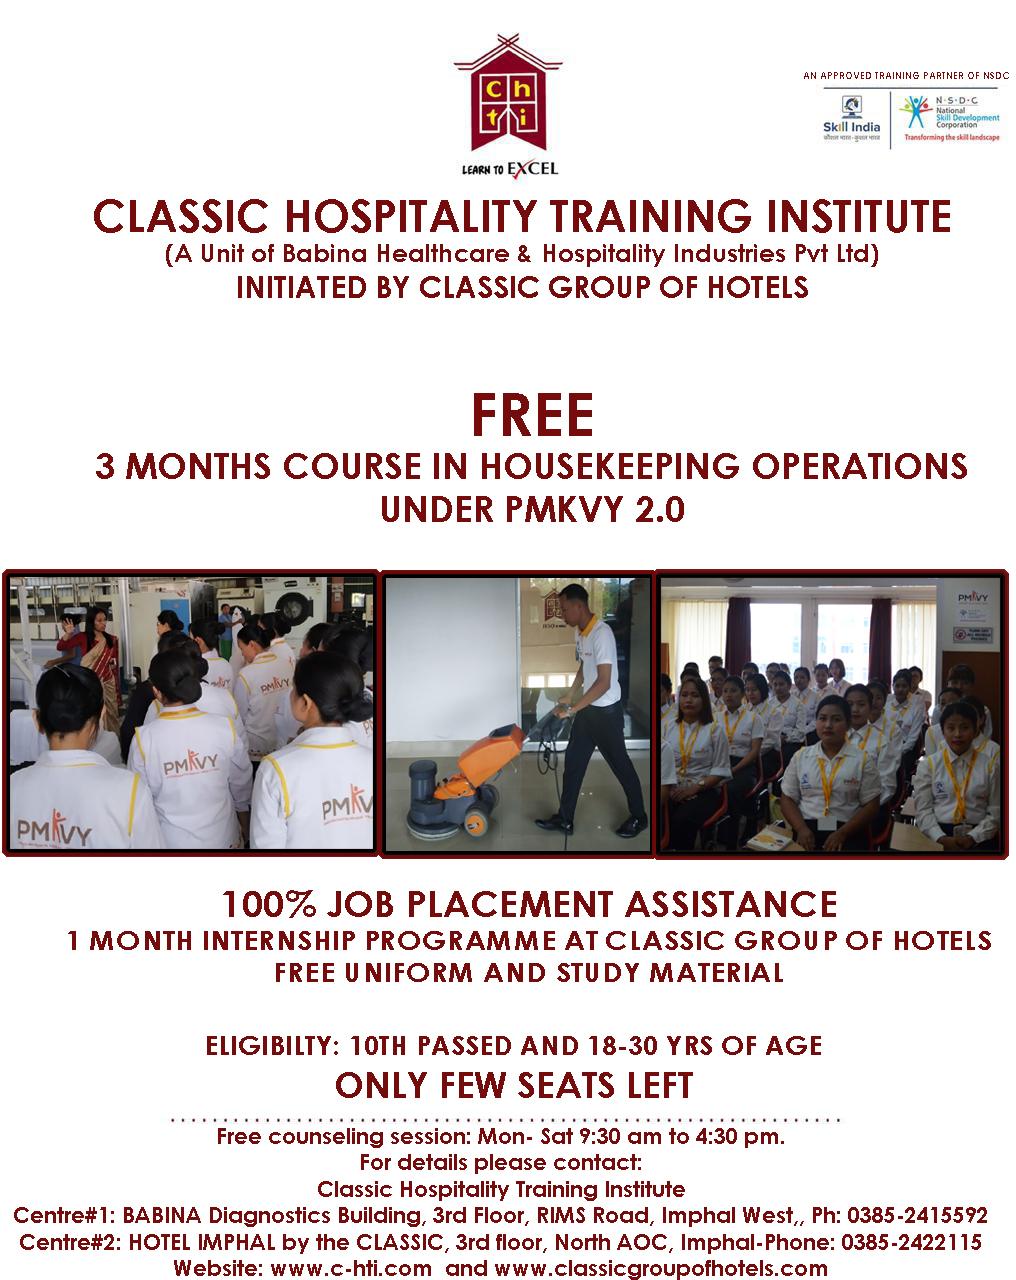 Classic Hospitality Training Institute